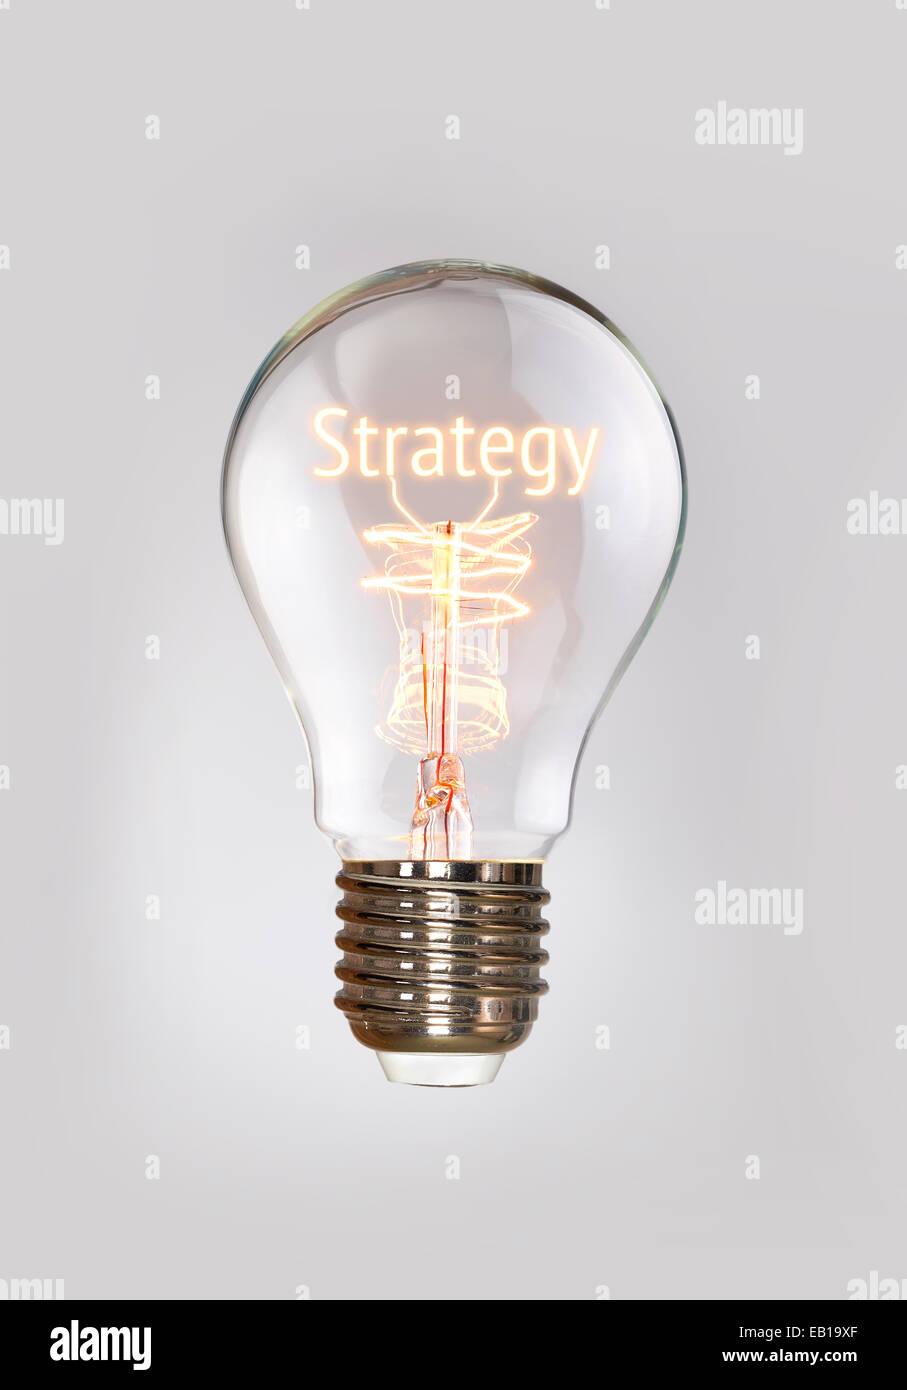 Strategiekonzept in ein Filament-Glühbirne. Stockbild